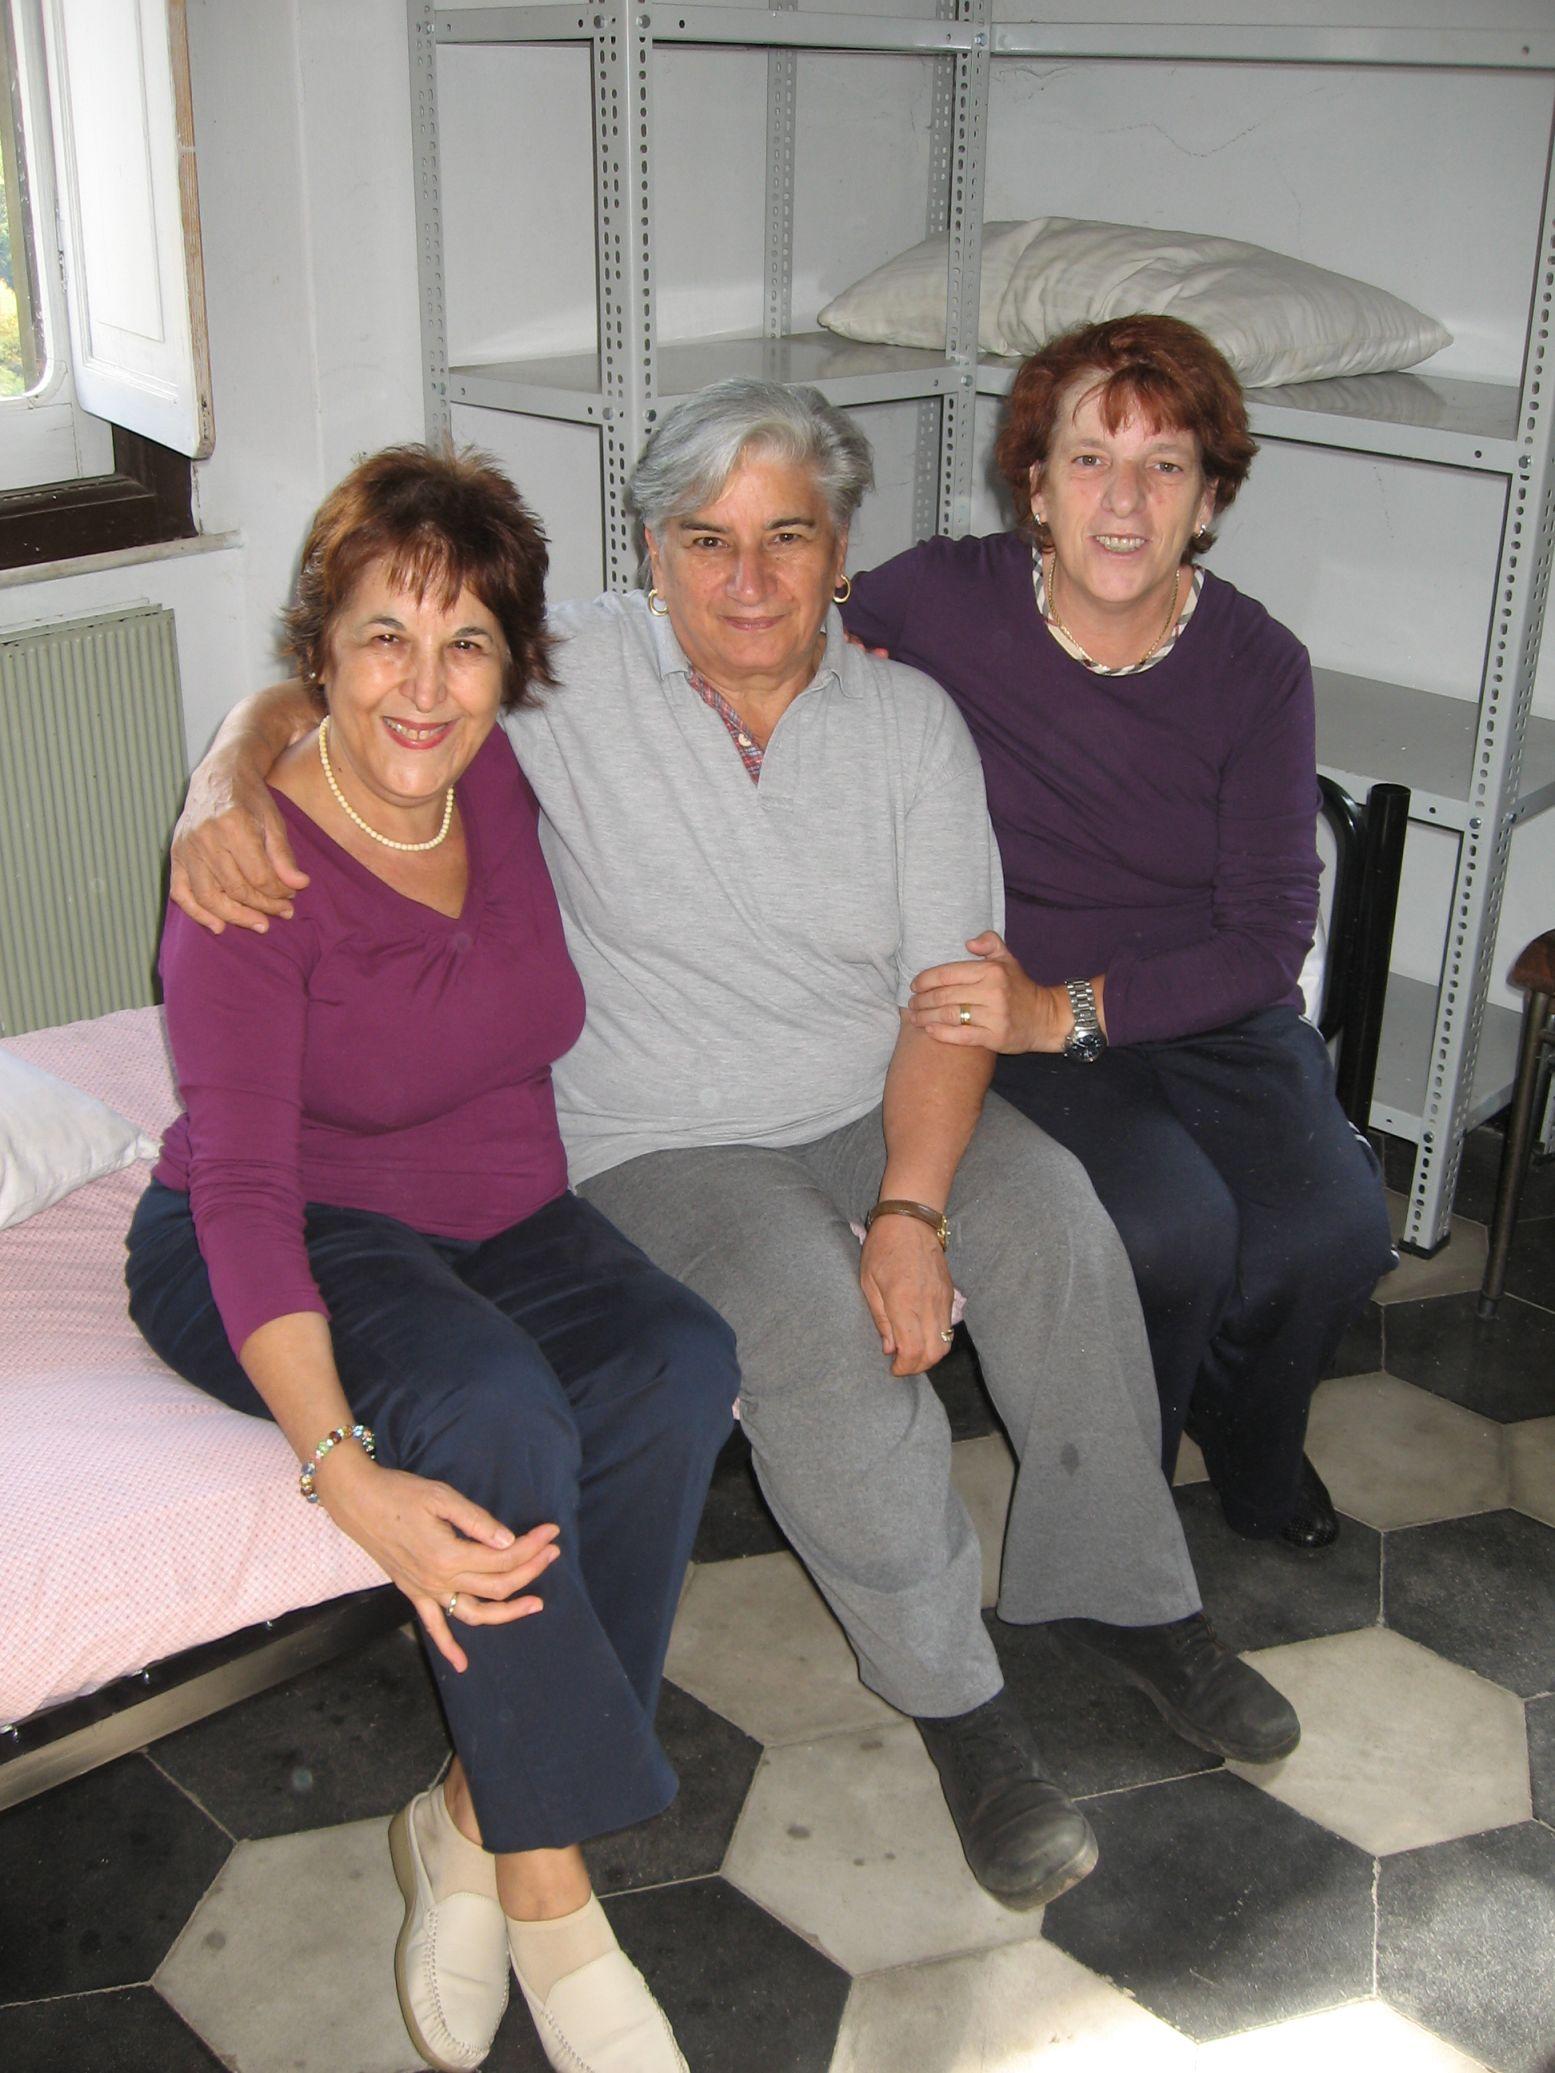 Bivacco_Persone_Impegnate_Torriglia-2009-09-19--15.59.02